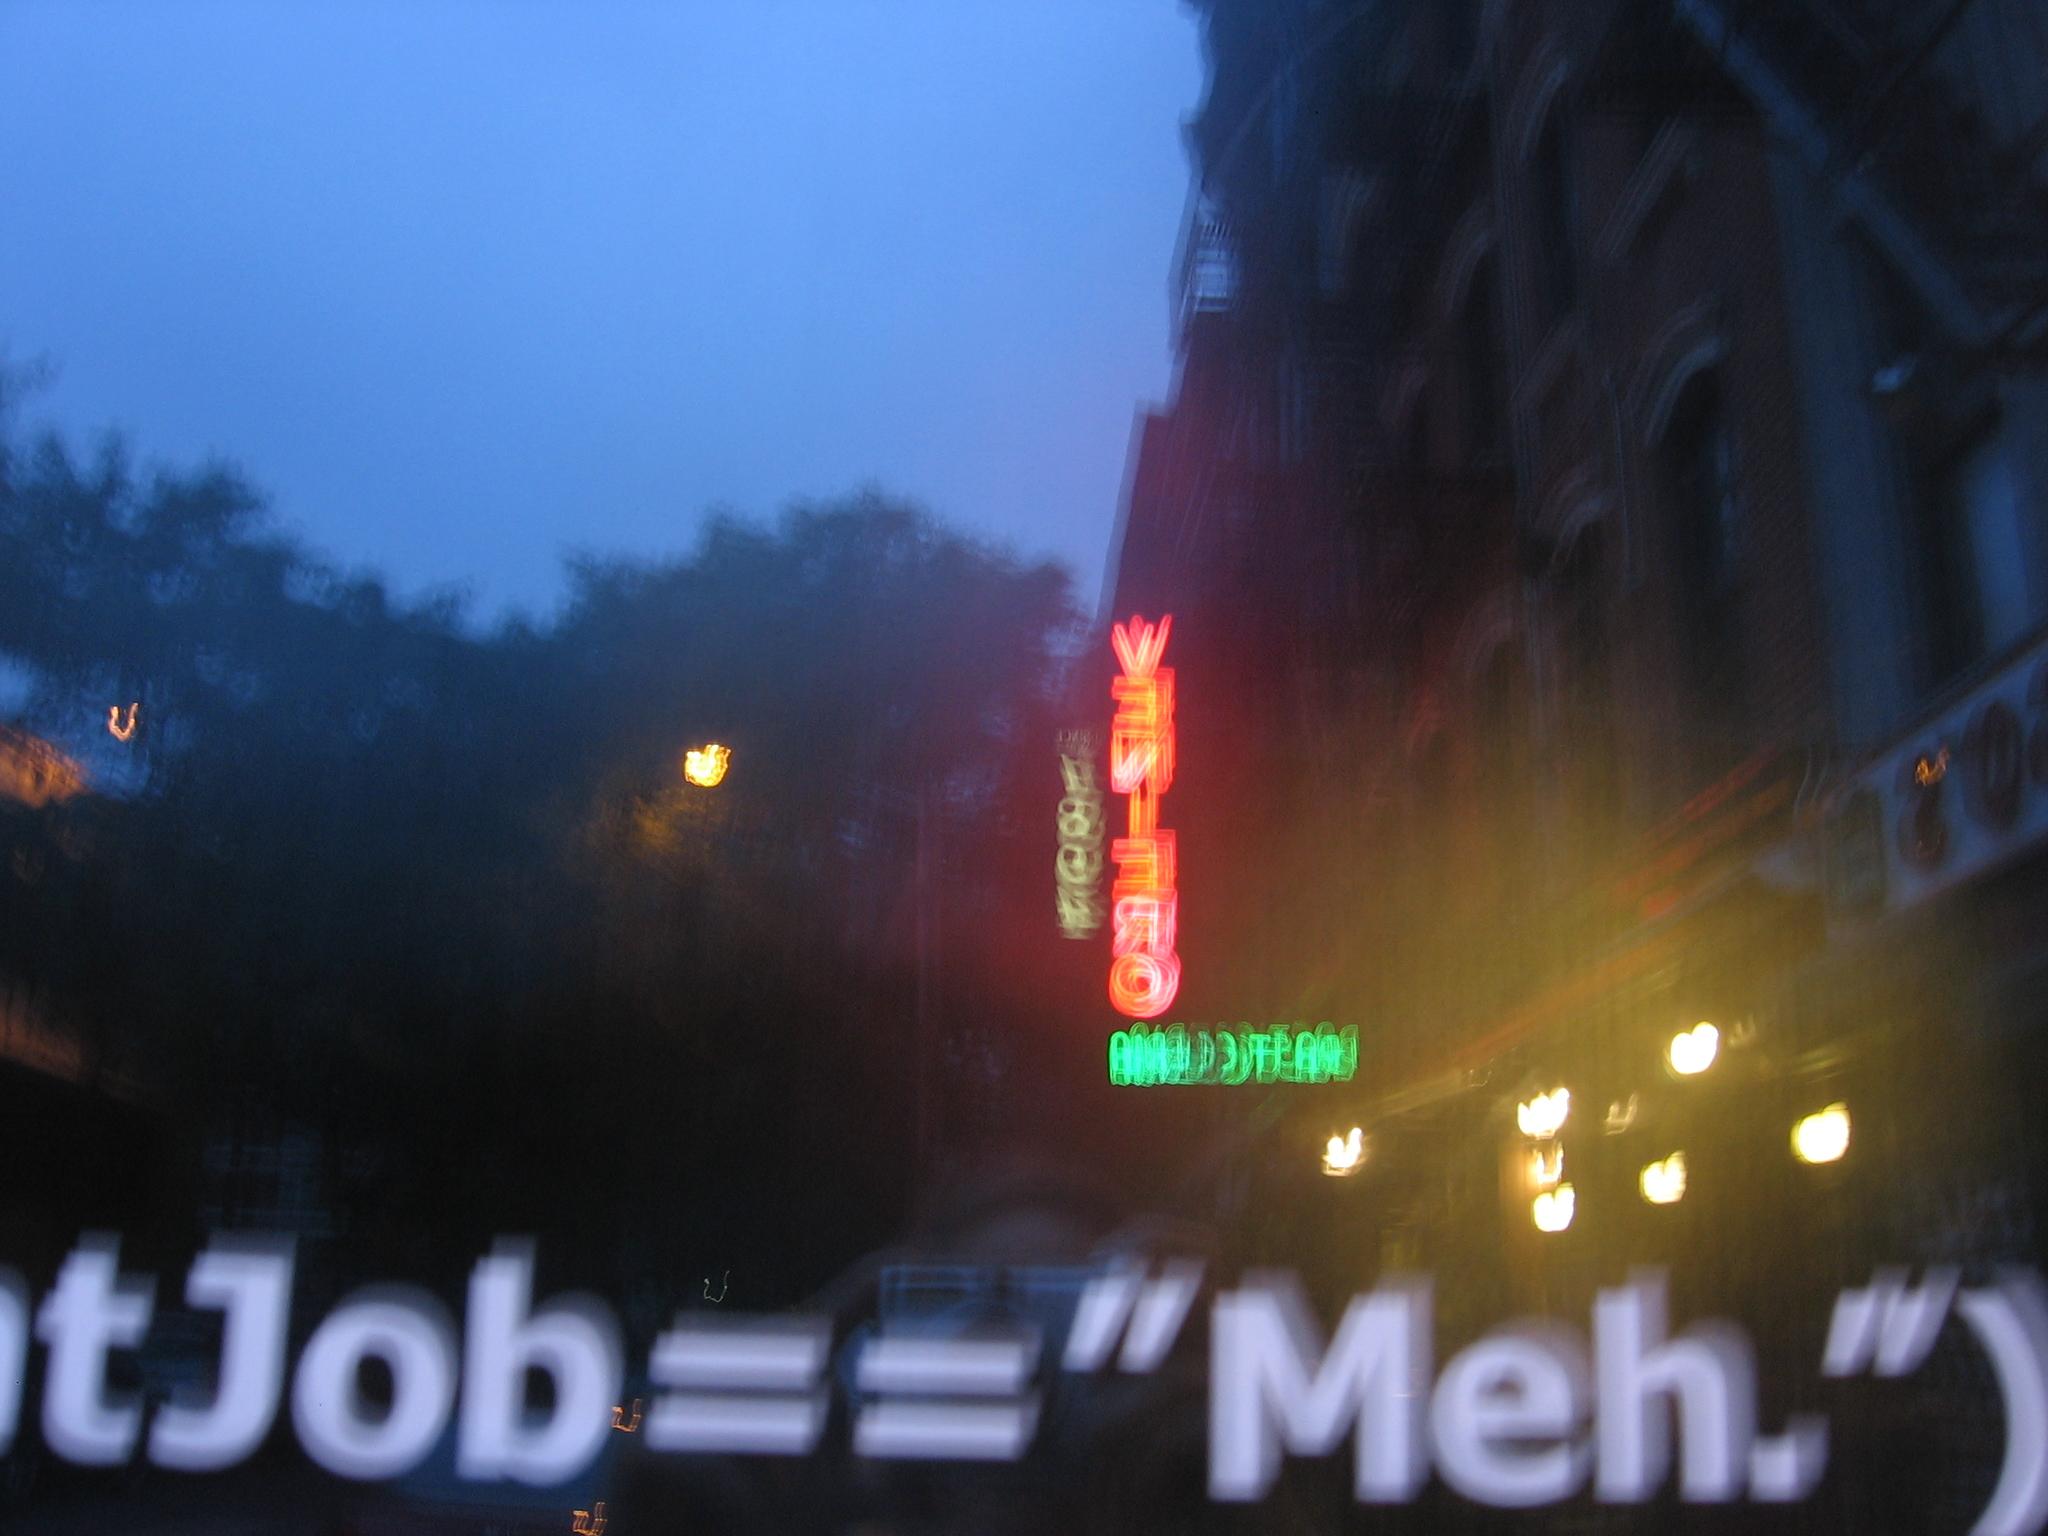 Job-meh sign.JPG